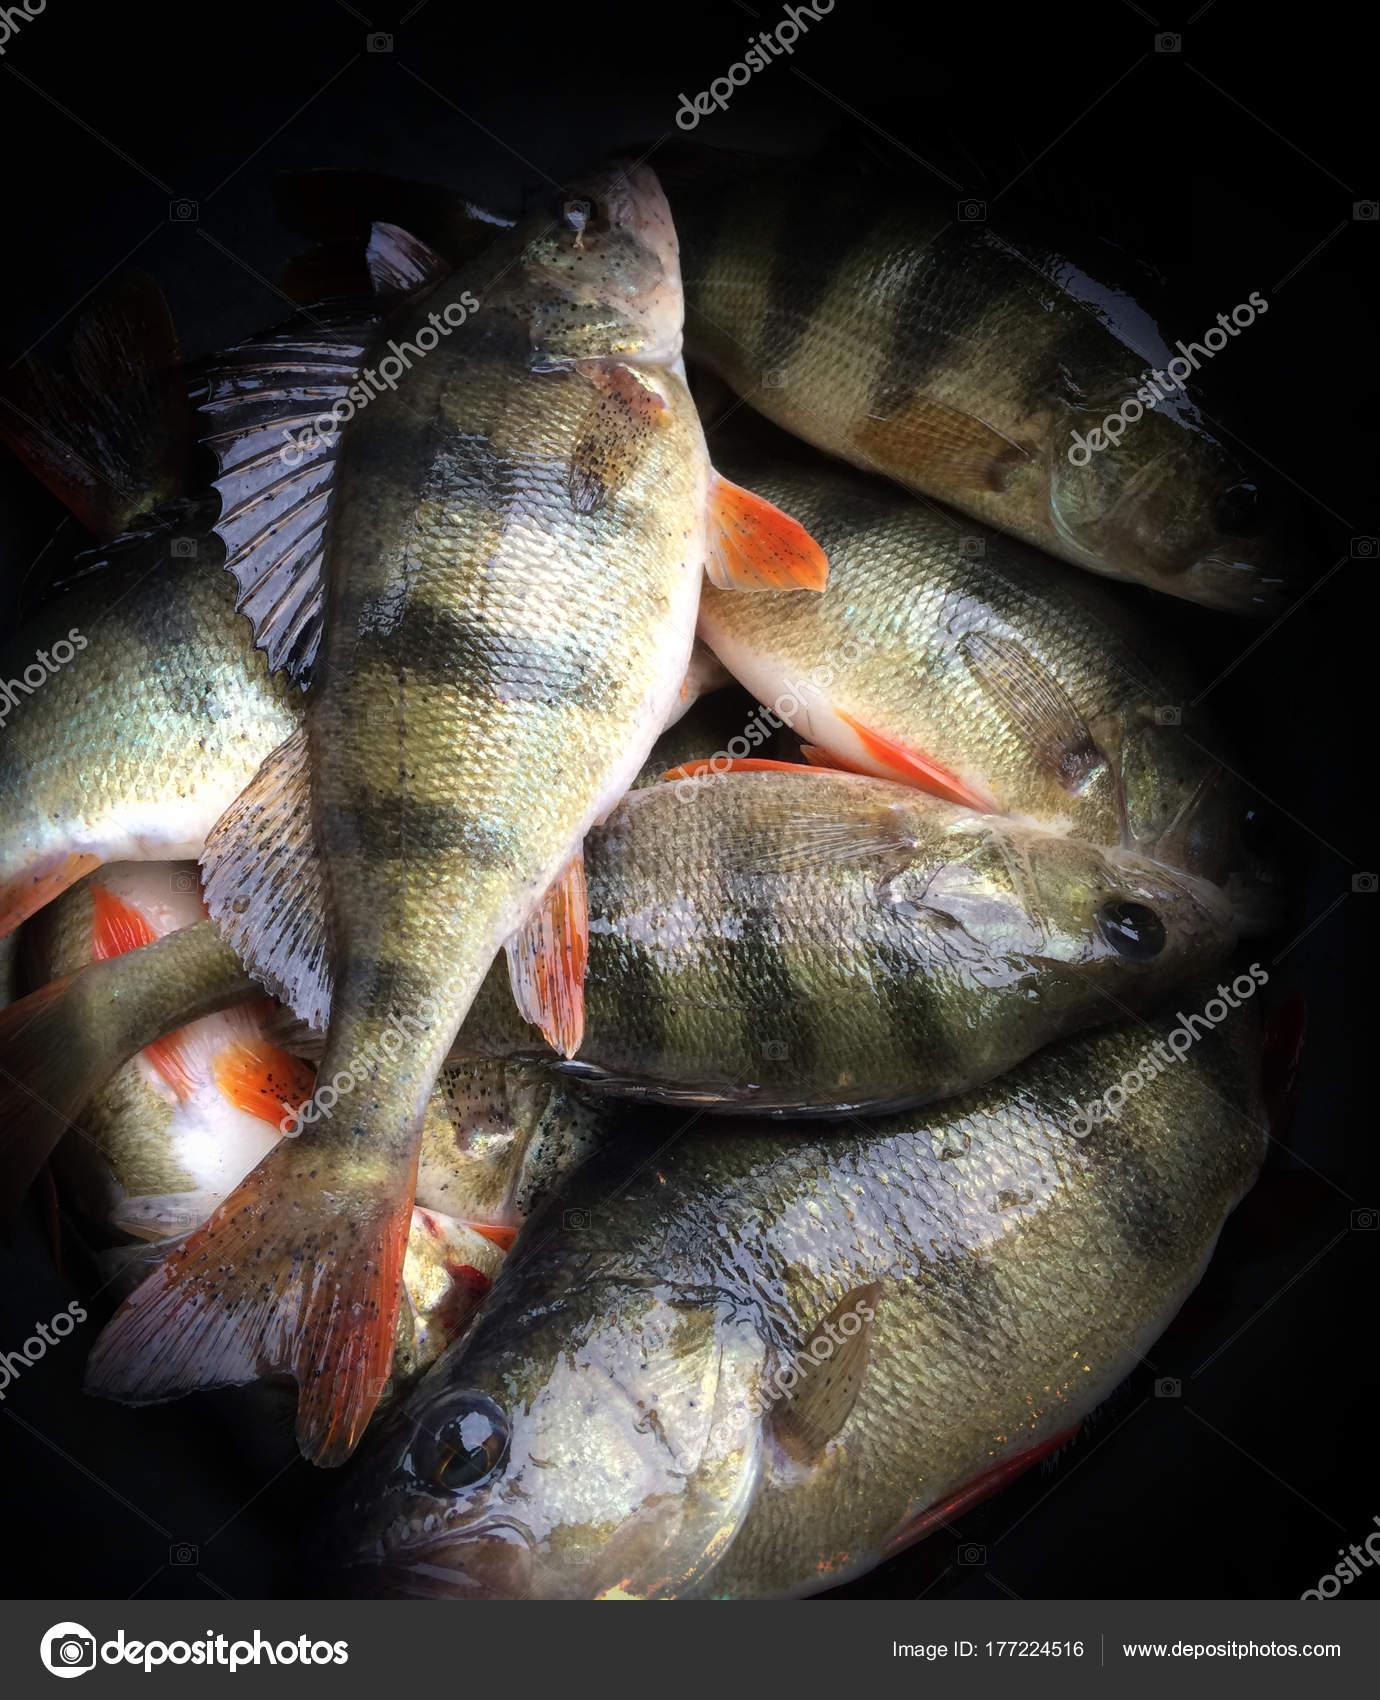 Wallpapers Hd Bass Fishing Bass Fish Texture Astrakhan Stock Photo C Gorlov 177224516